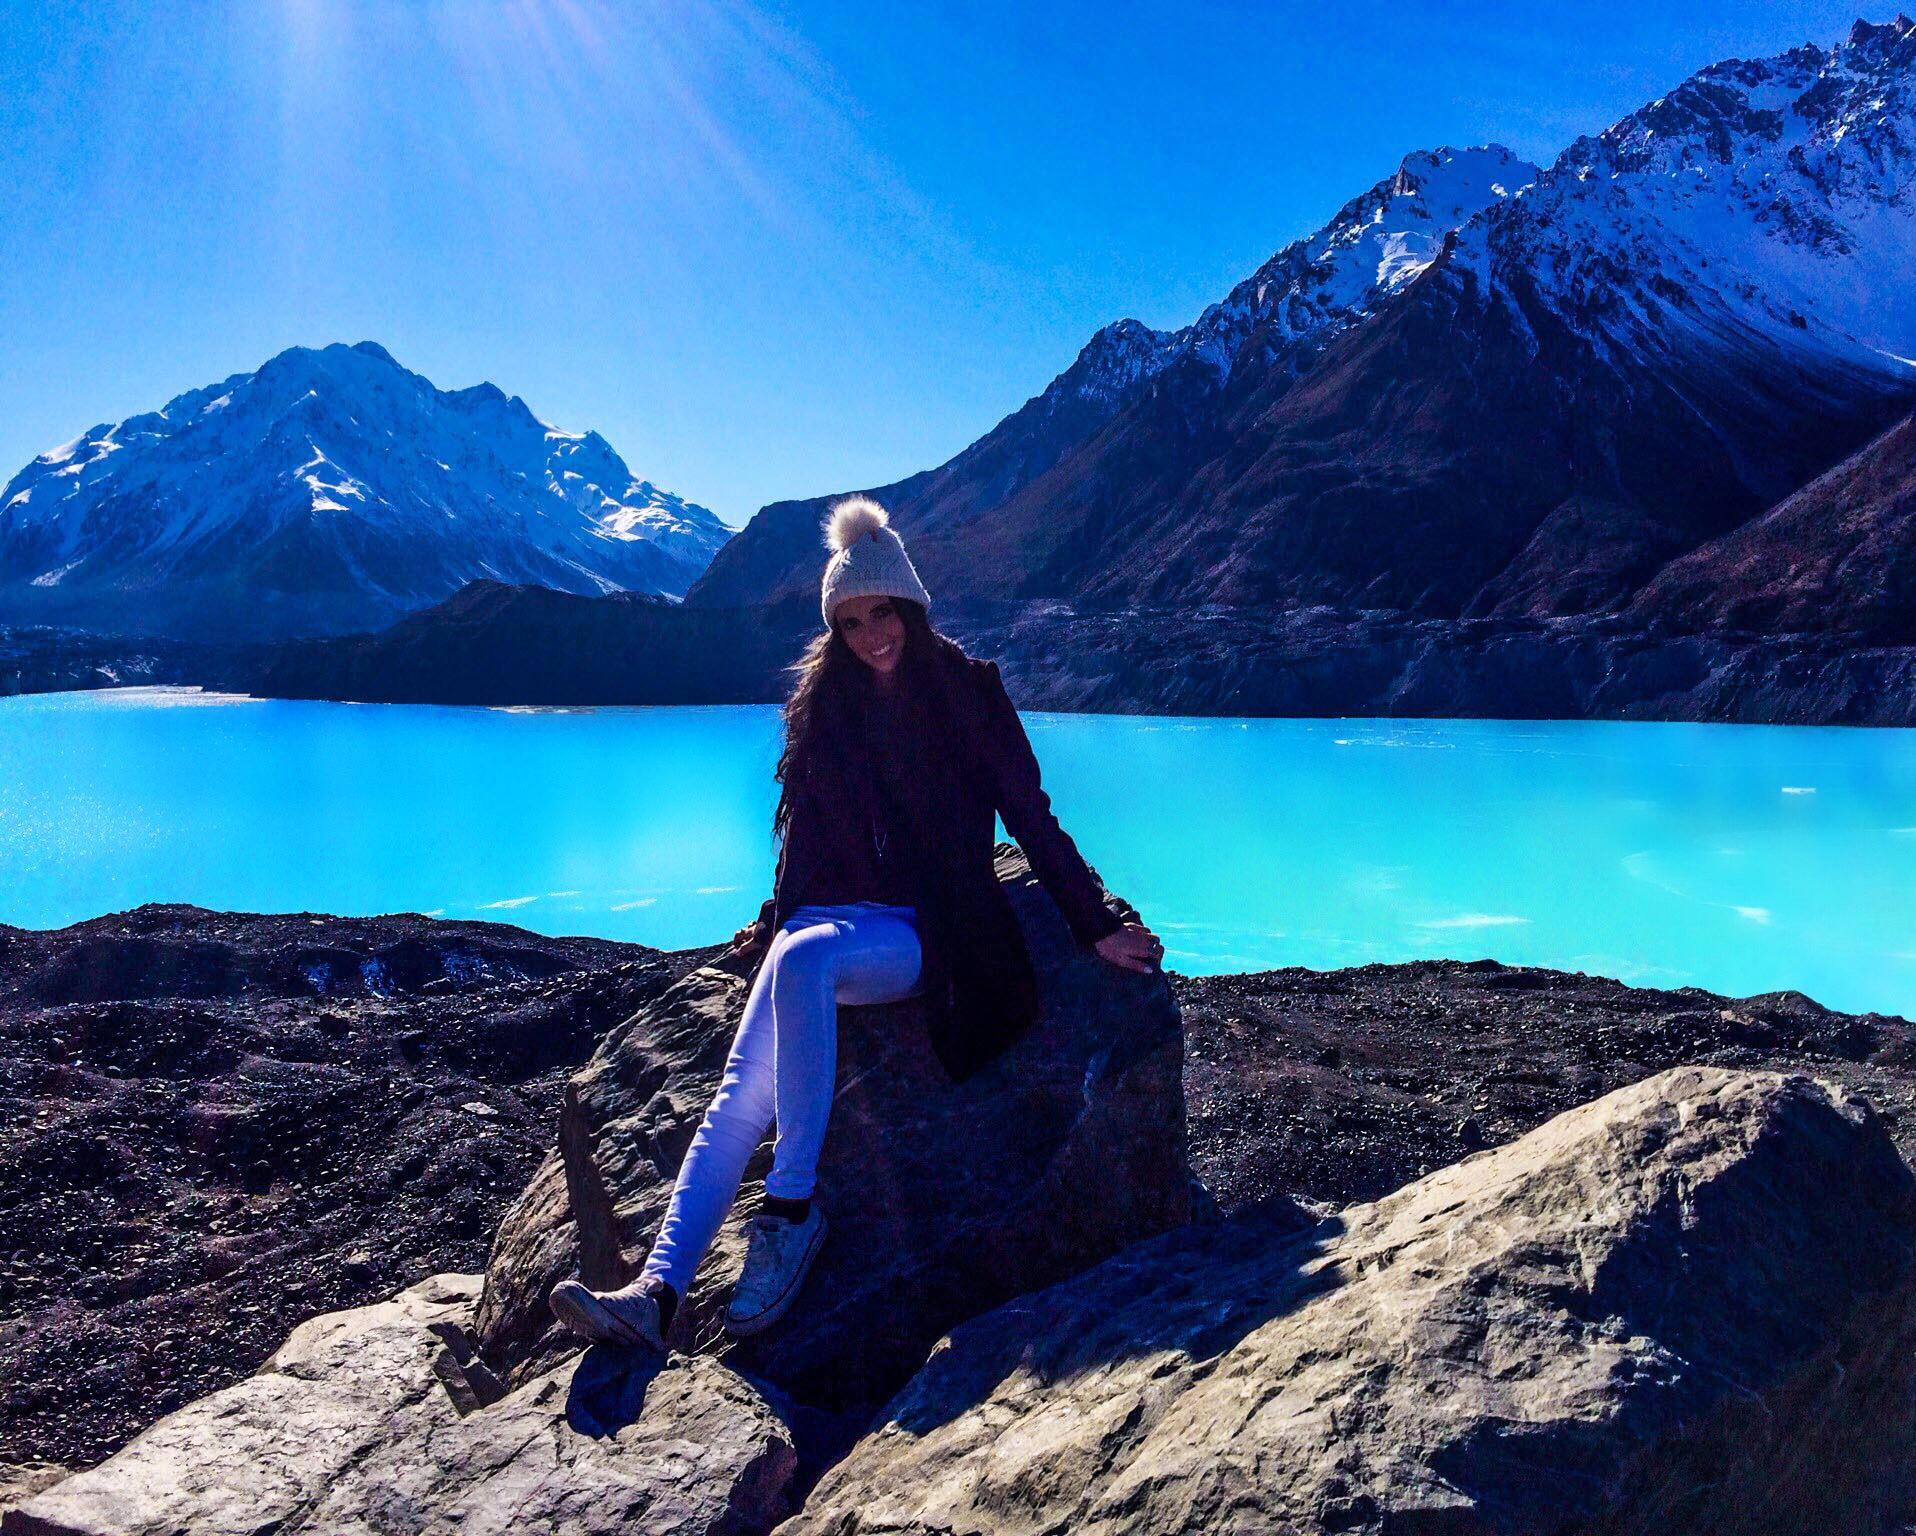 lake mountains thisworldexists lauren baxter adventure